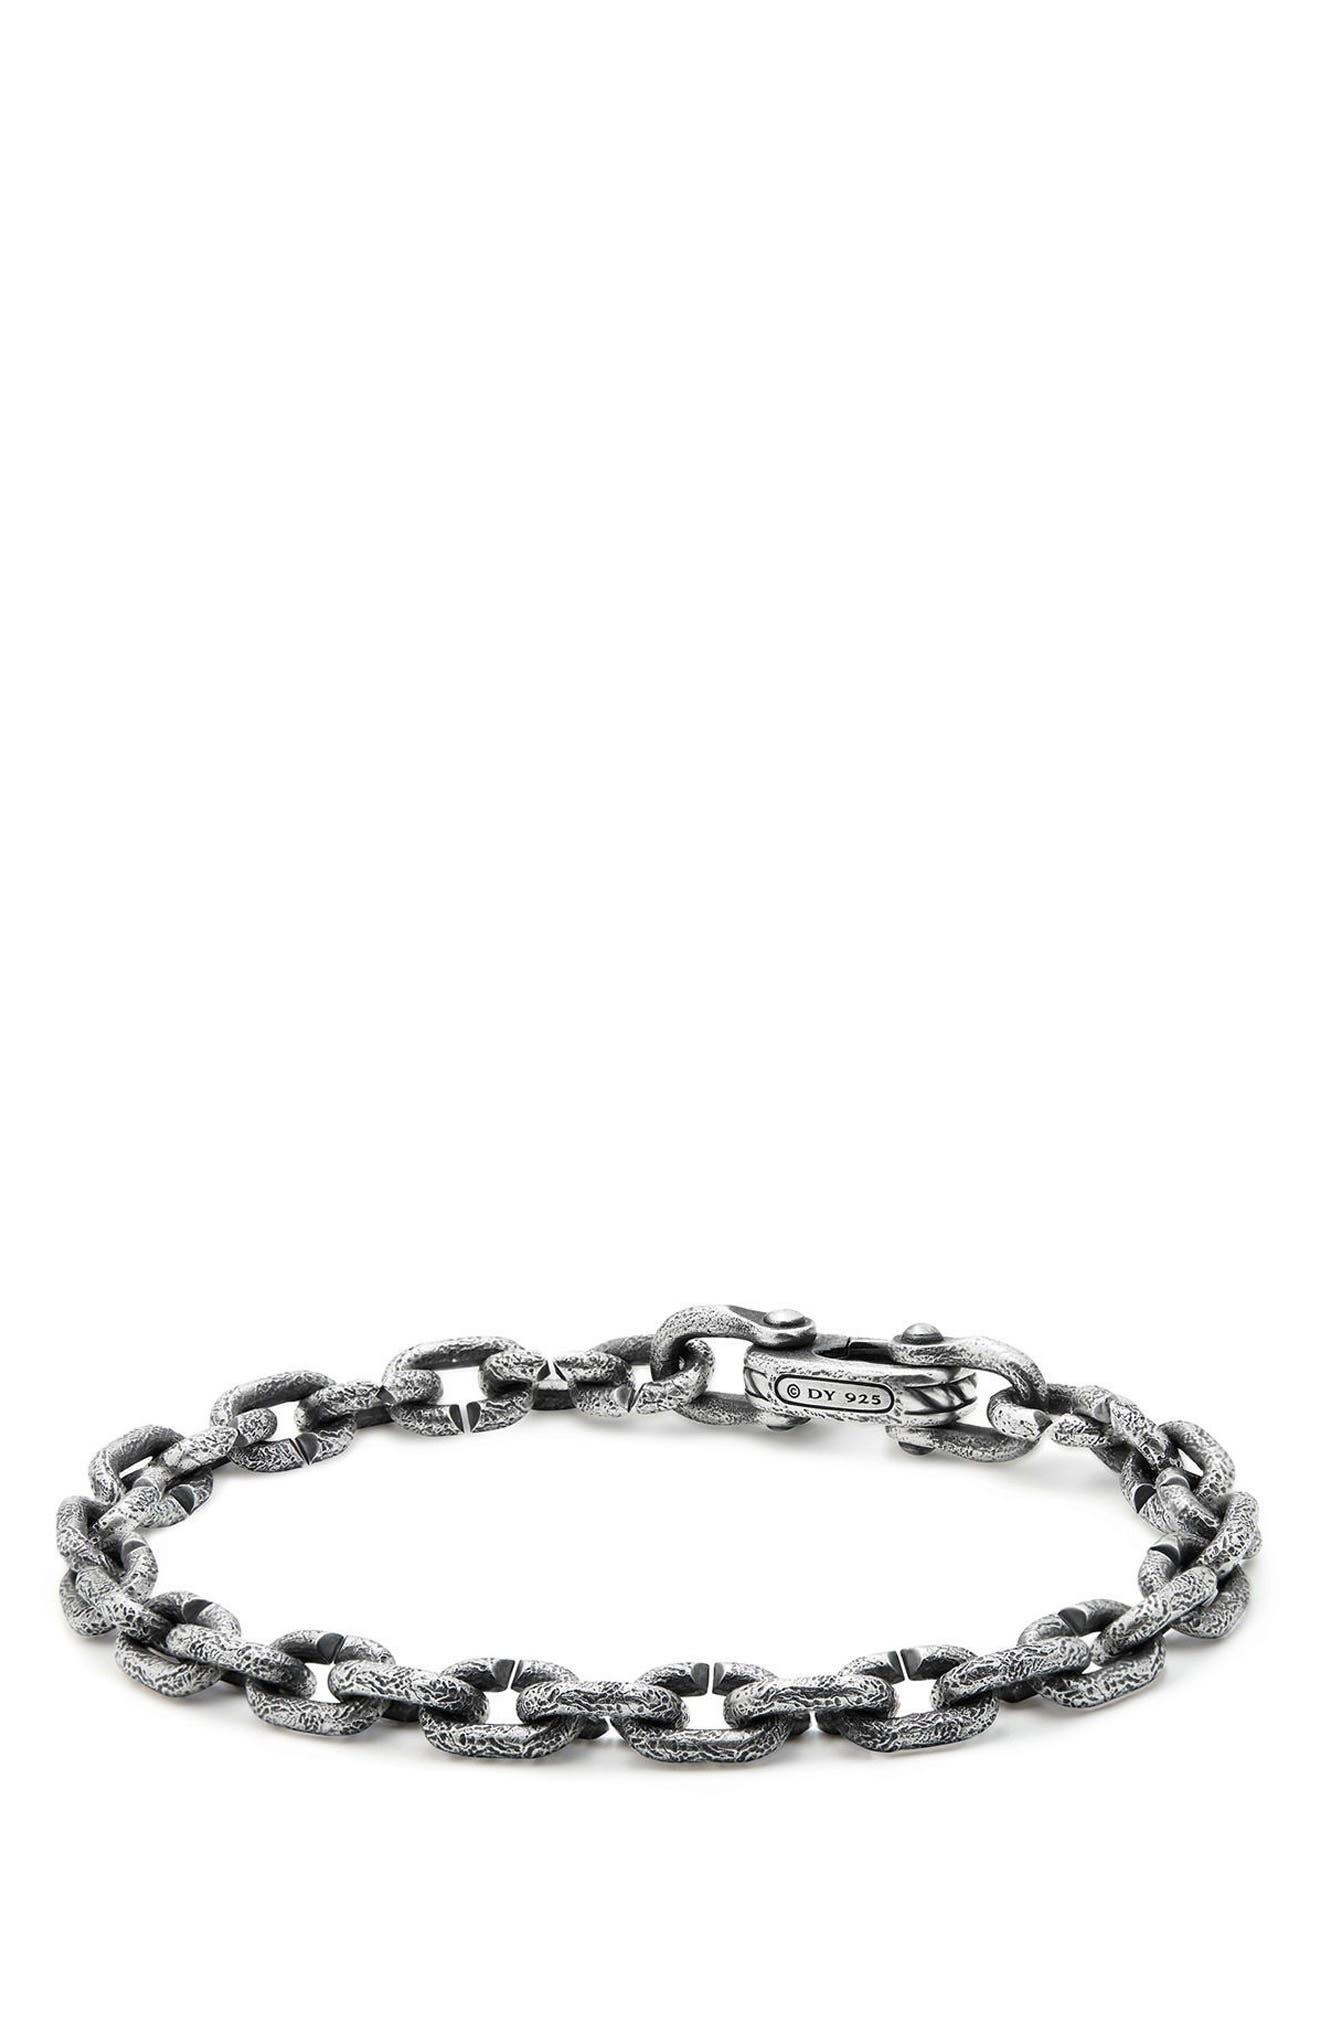 DAVID YURMAN Shipwreck Chain Bracelet, 6mm, Main, color, SILVER